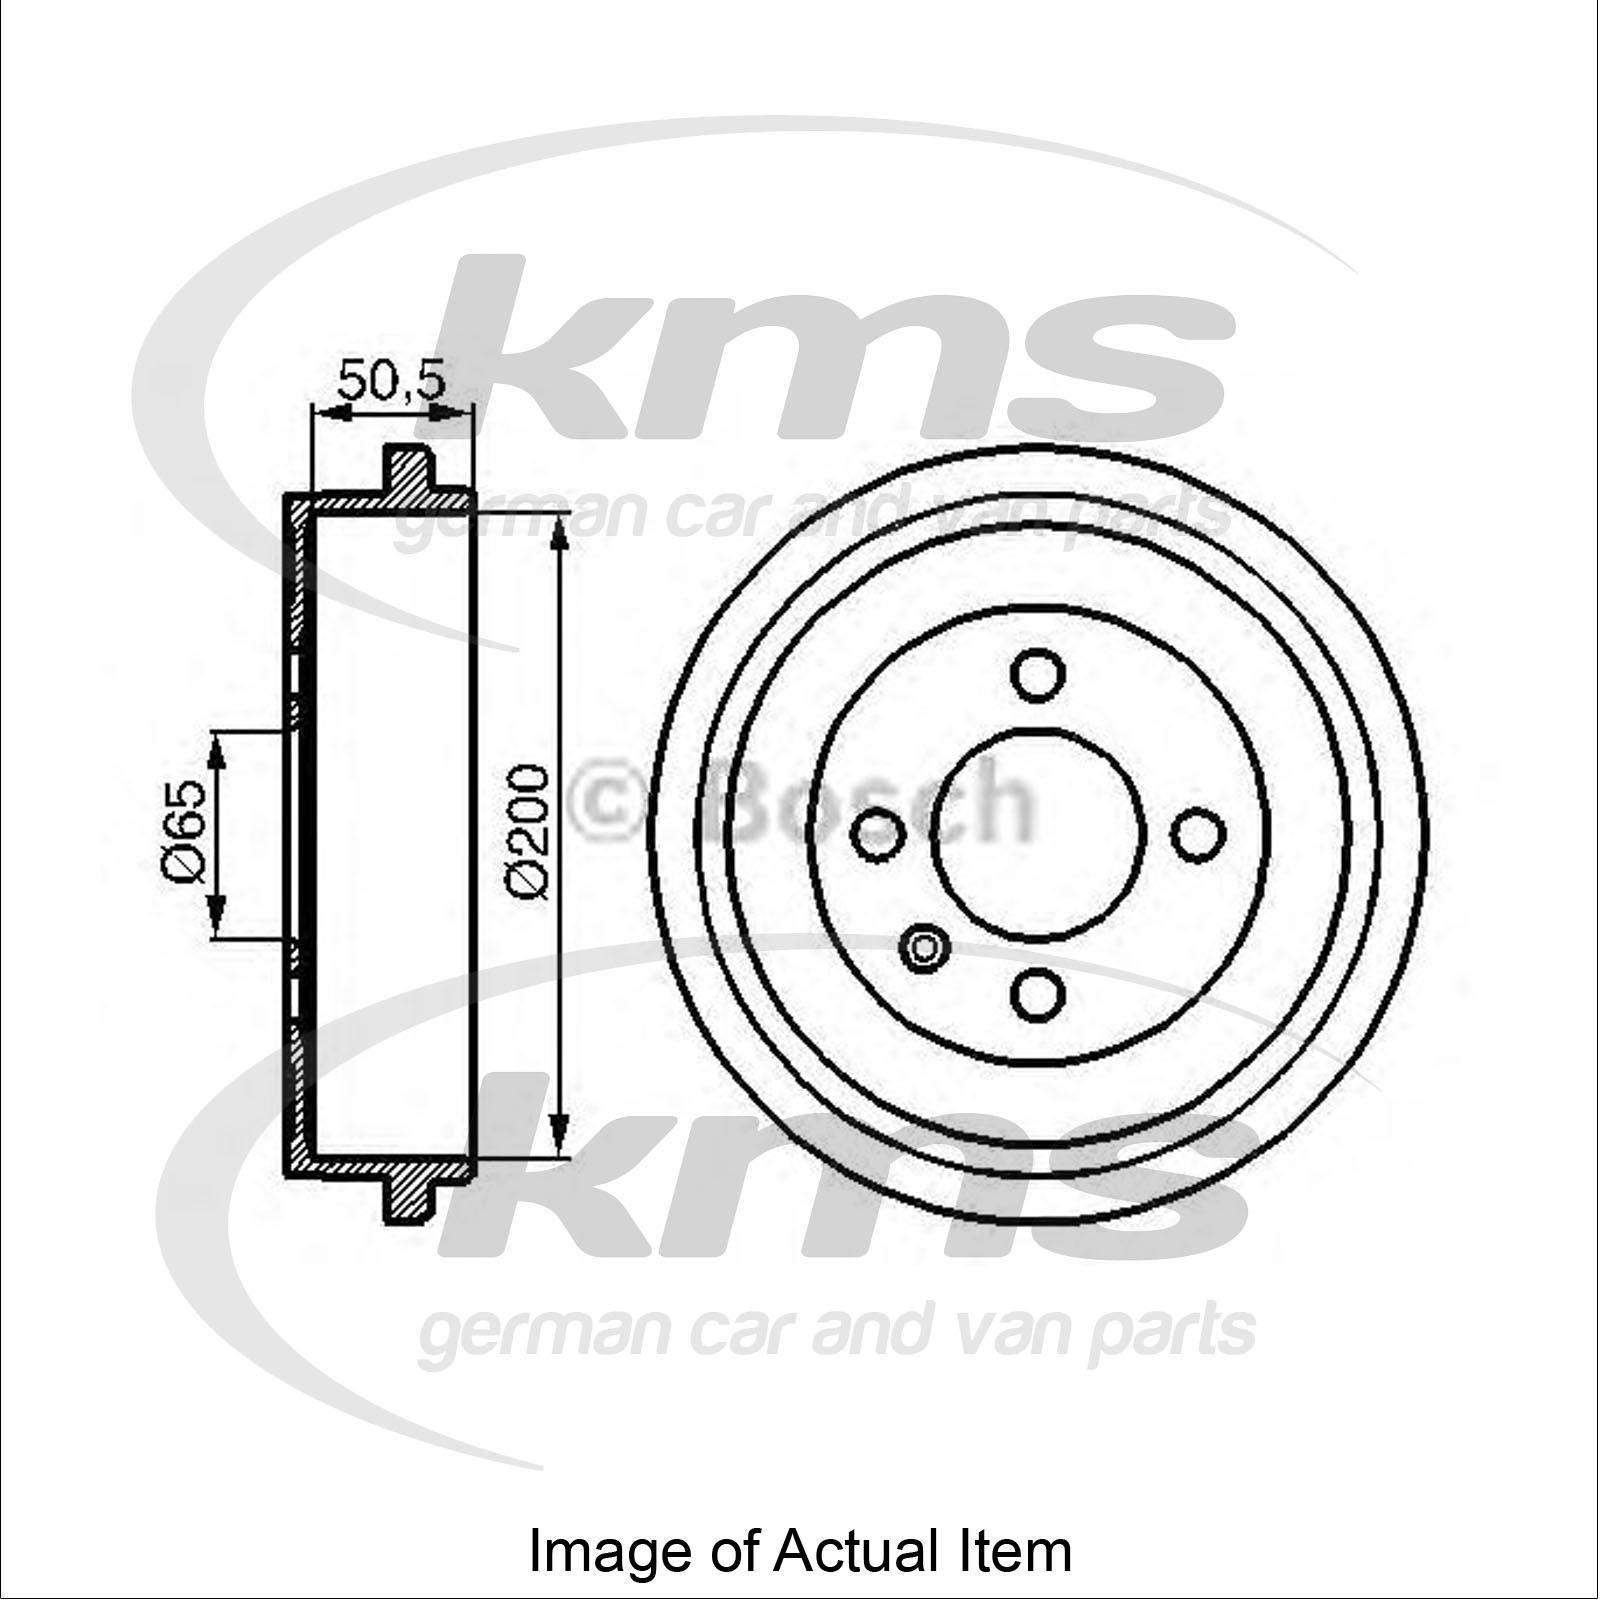 brake drum vw polo 6n1 64 1 9 sdi hatchback 64 bhp top german quality ebay. Black Bedroom Furniture Sets. Home Design Ideas